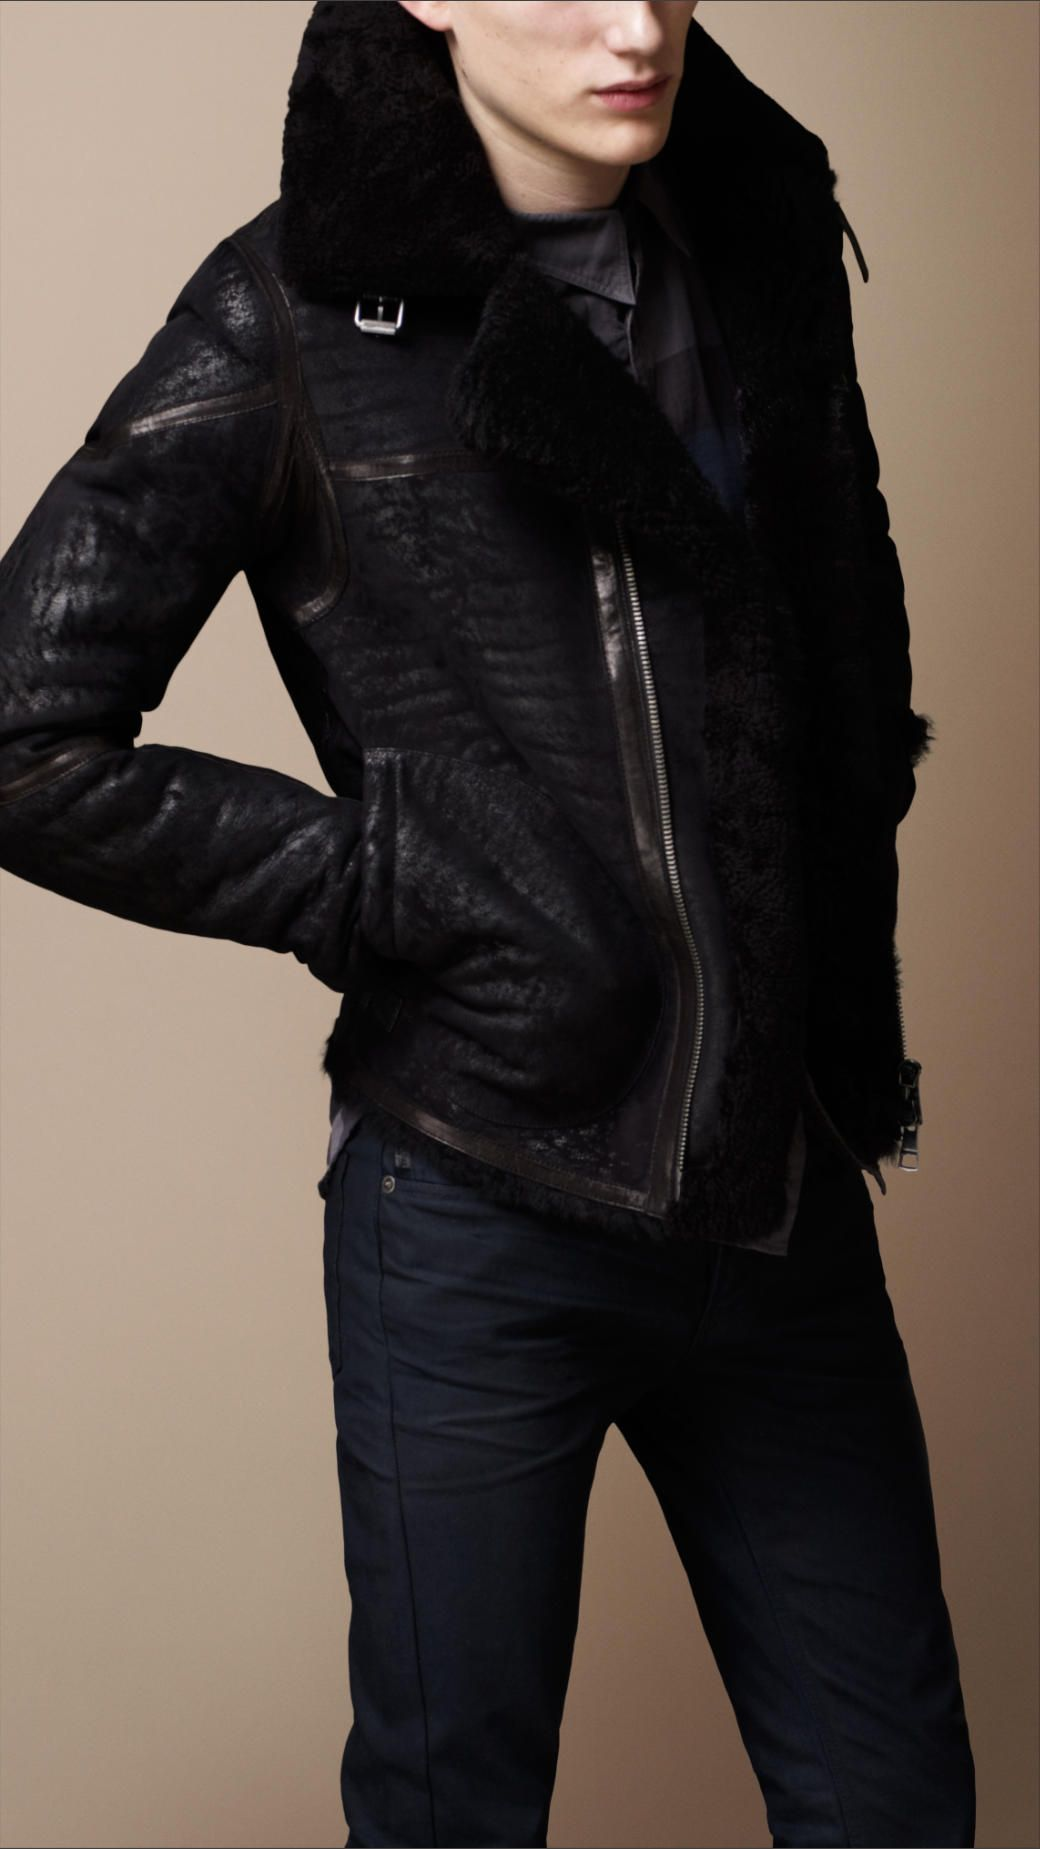 Men S Coats Jackets Burberry United States Leather Jacket Men Biker Jacket Jackets [ 1849 x 1040 Pixel ]